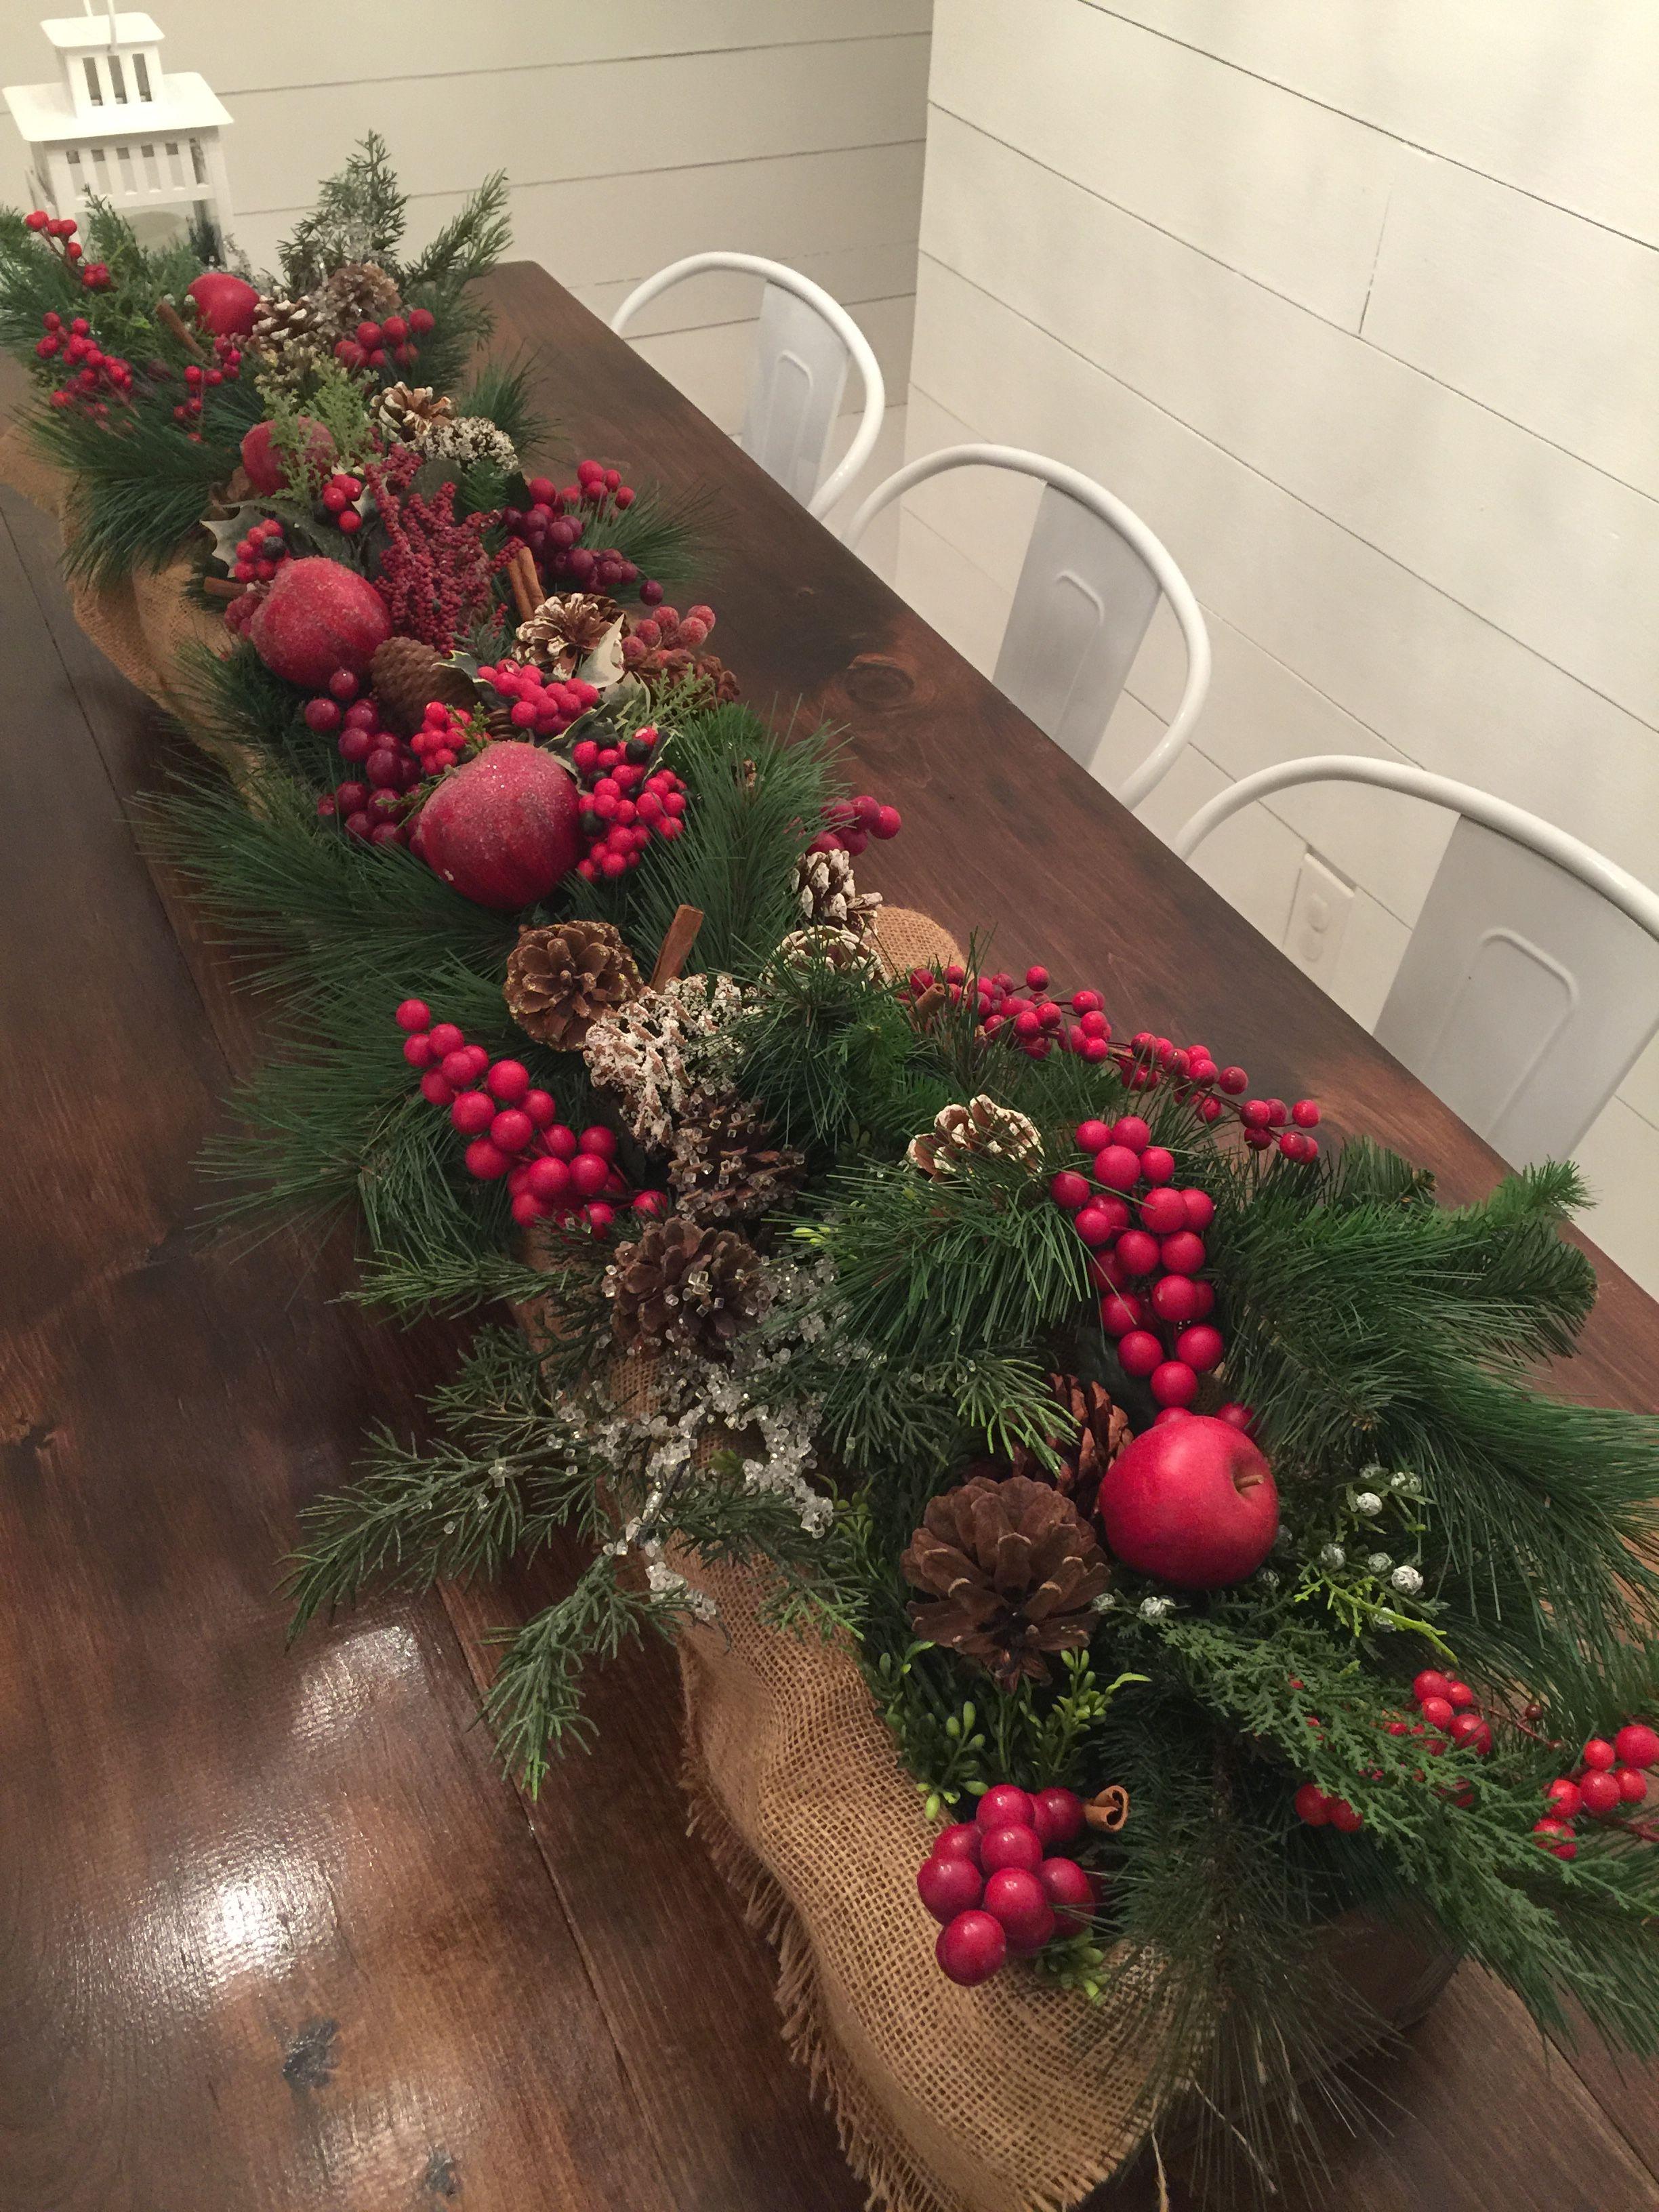 Wooden Box Christmas Centerpiece With Burlap Berries Pine Cones Apples Cinnamon St Christmas Centerpieces Christmas Decorations Christmas Table Decorations